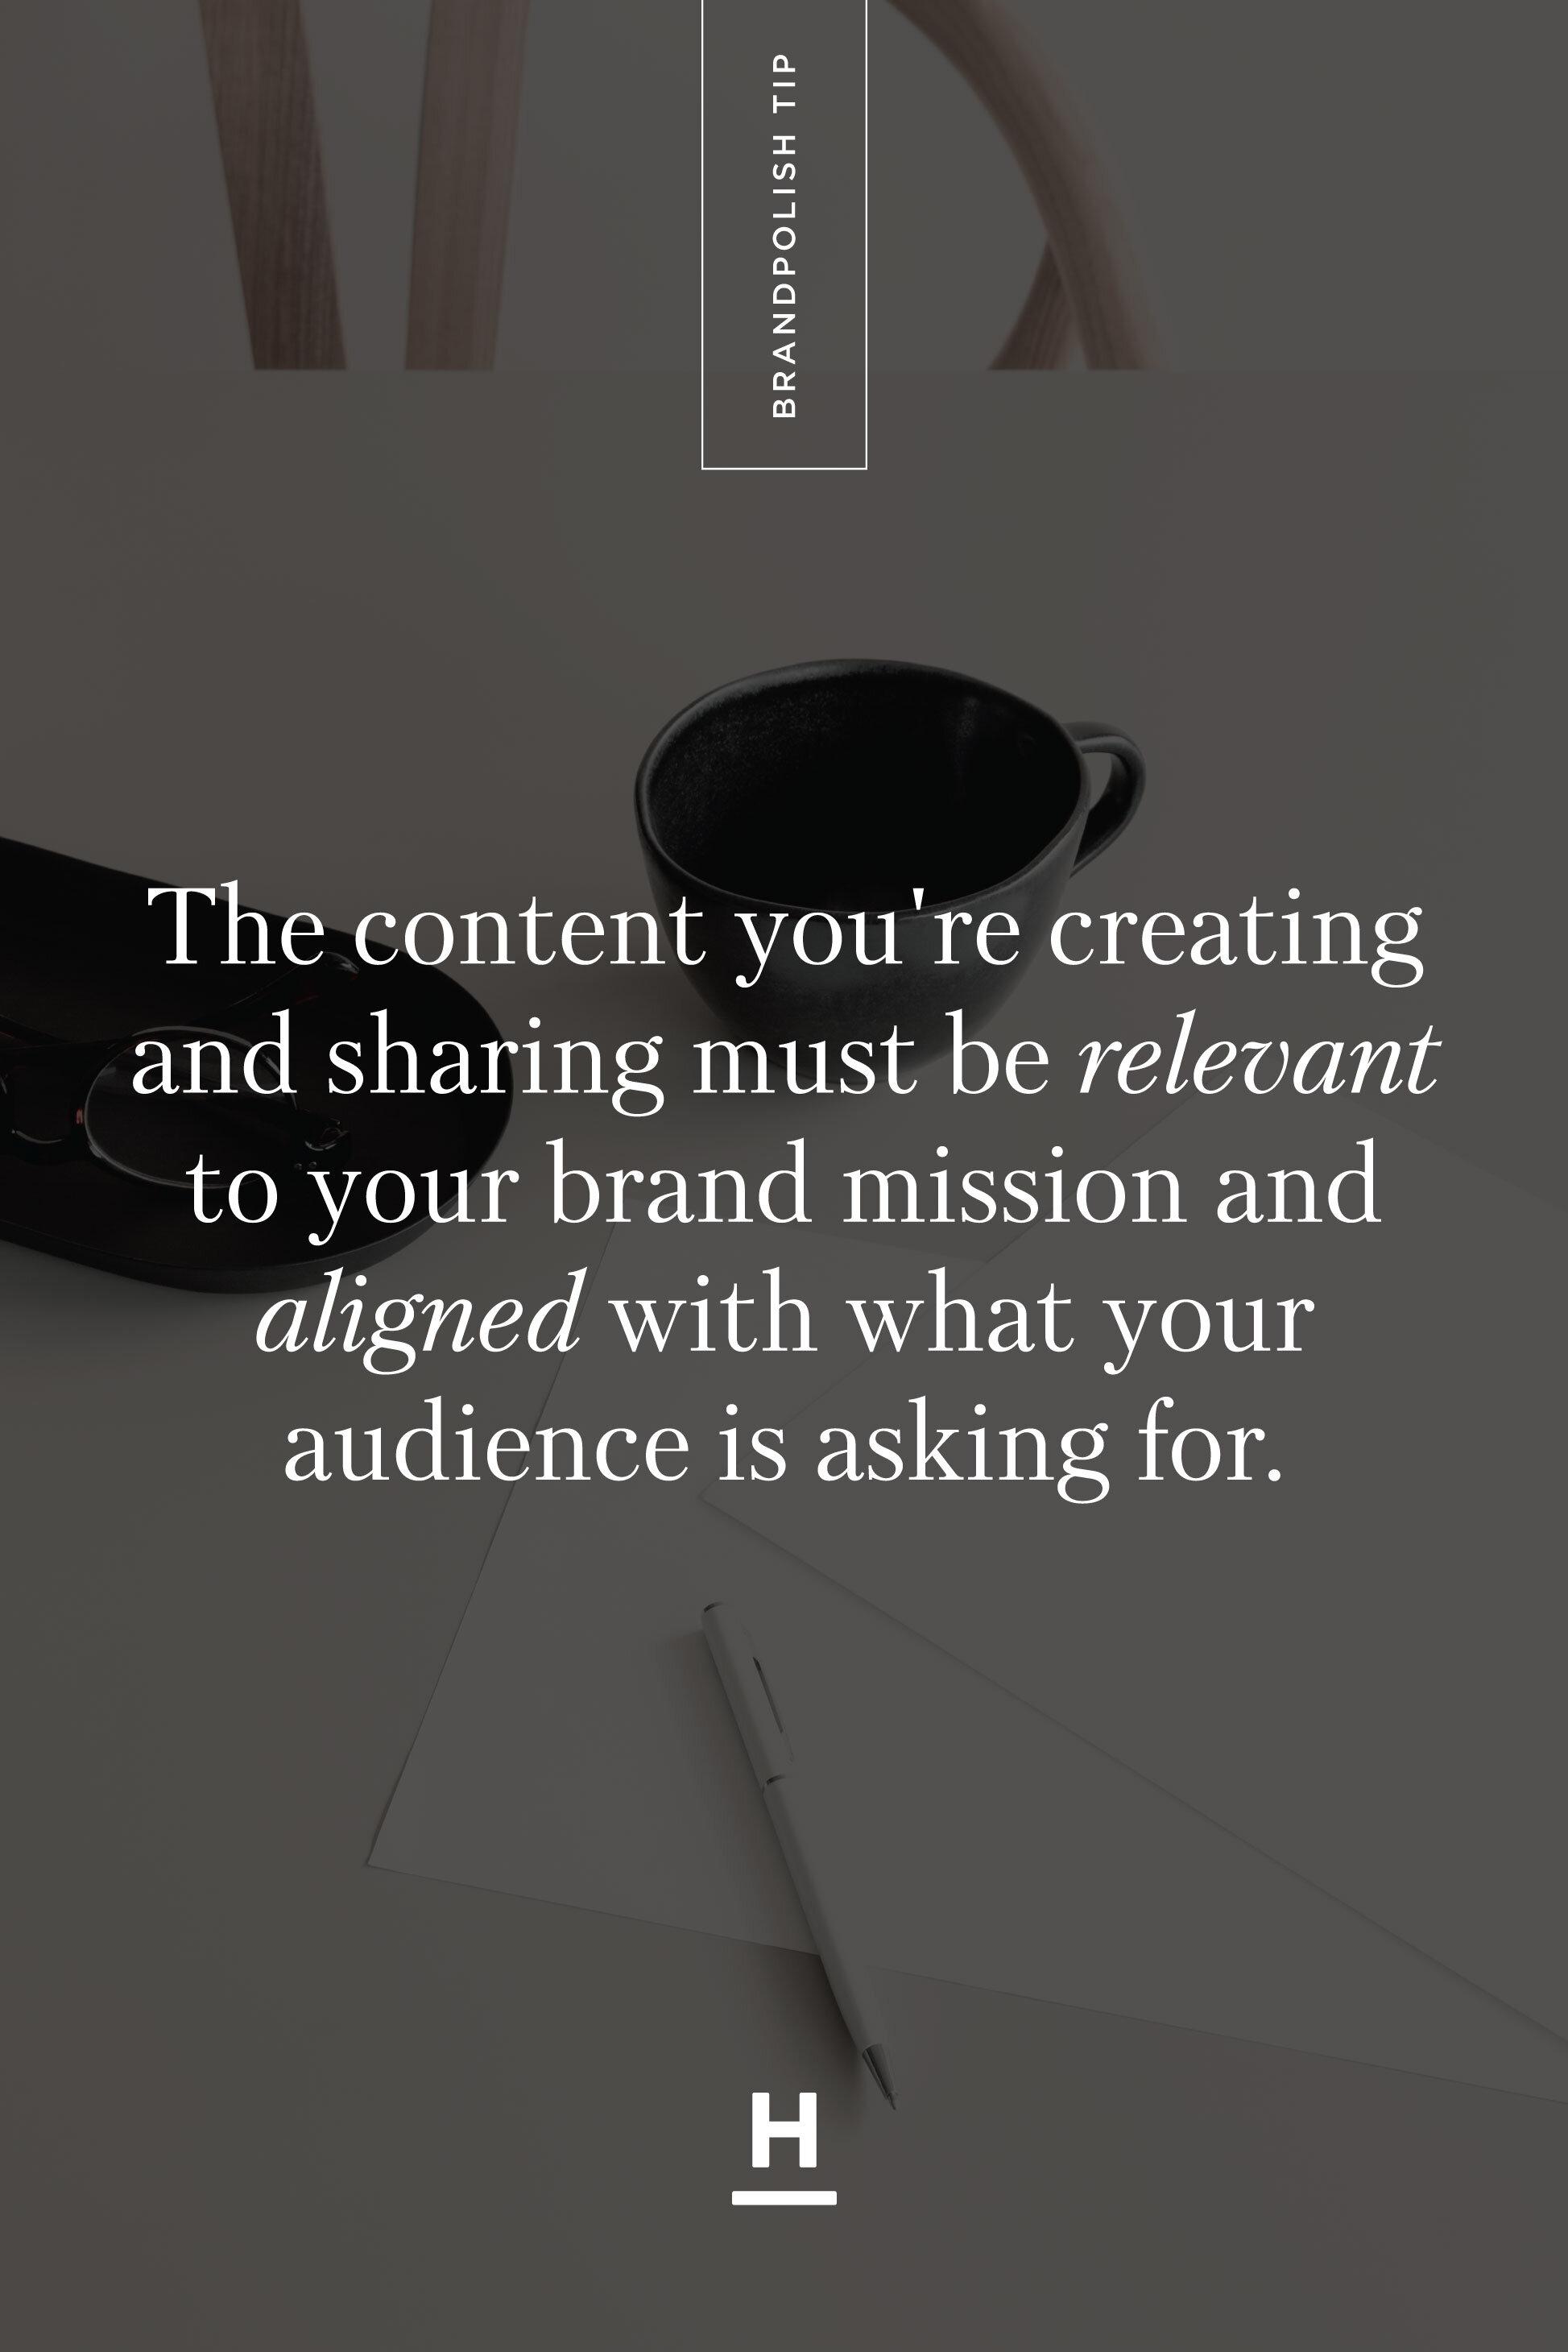 hilaryhartling.com-_-creating_sticky_content3.jpg